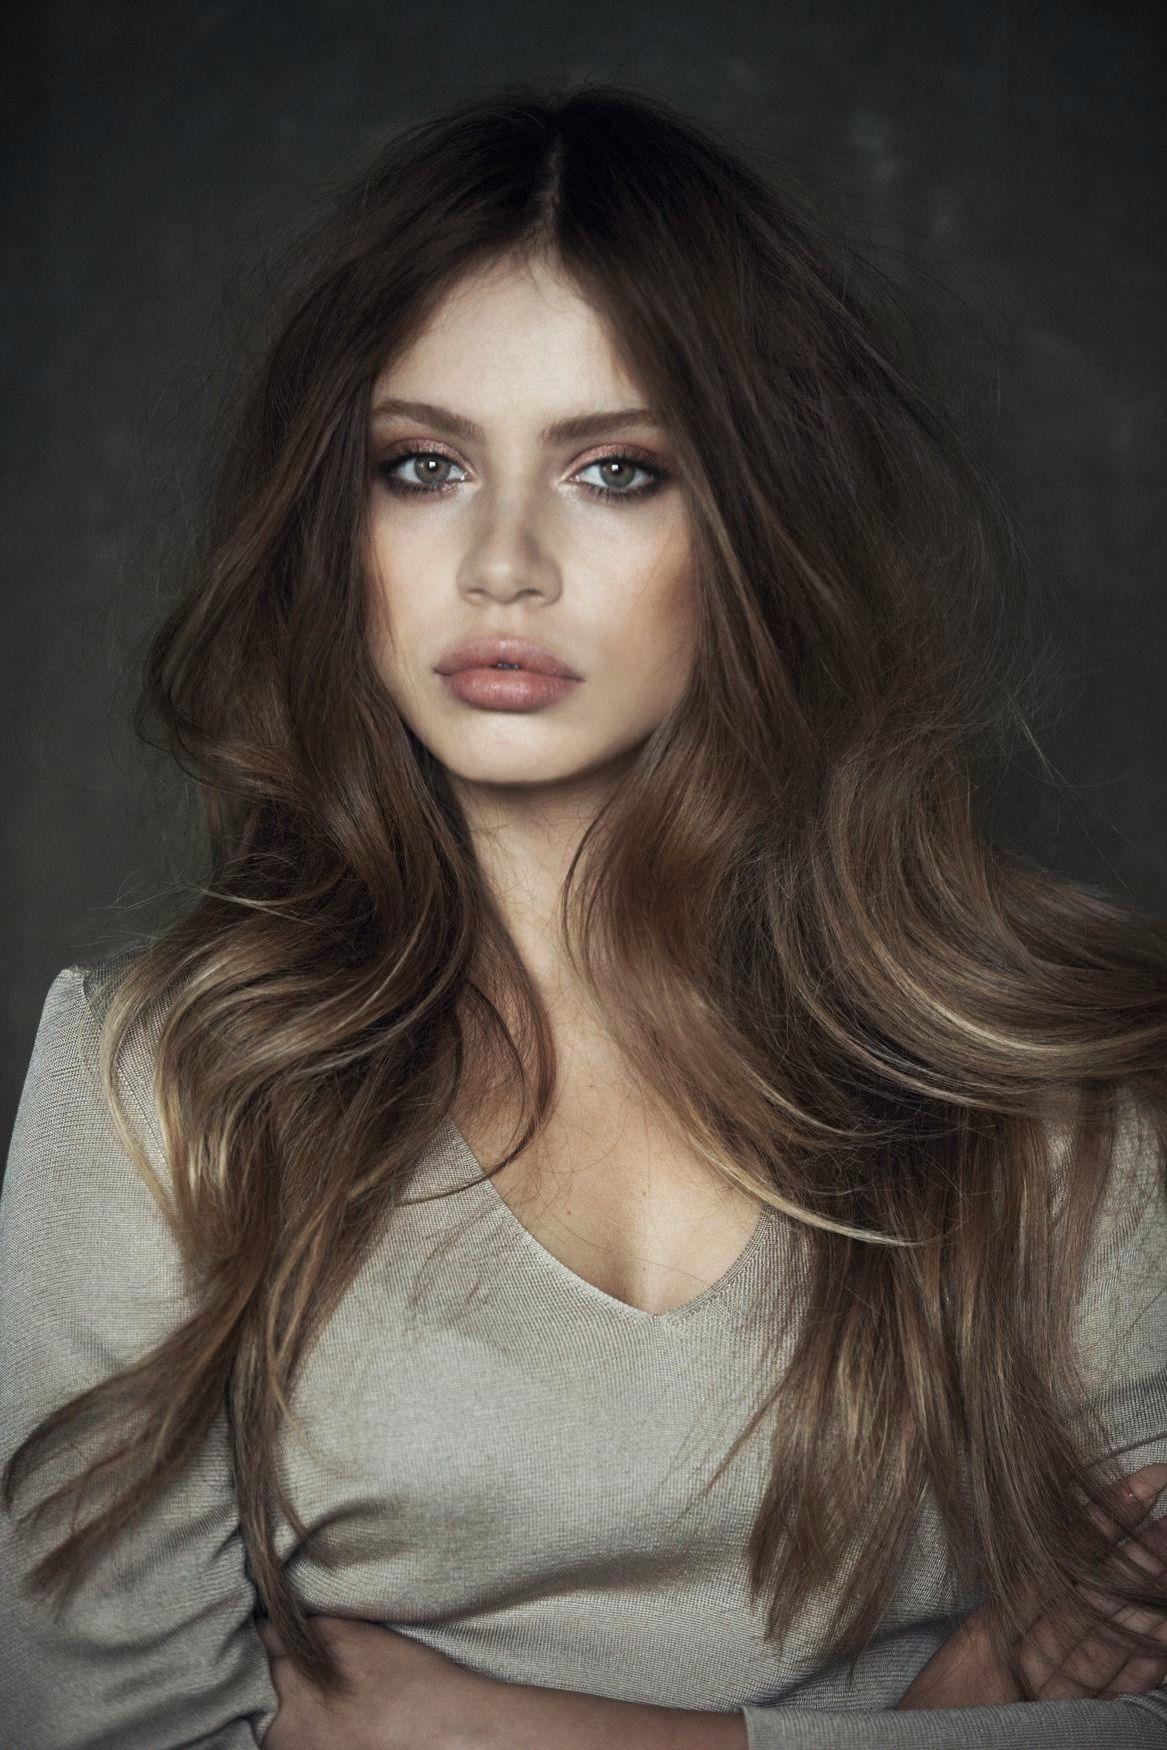 ZsaZsa Bellagio Fashion Babes Pinterest Hair Style And Make Up